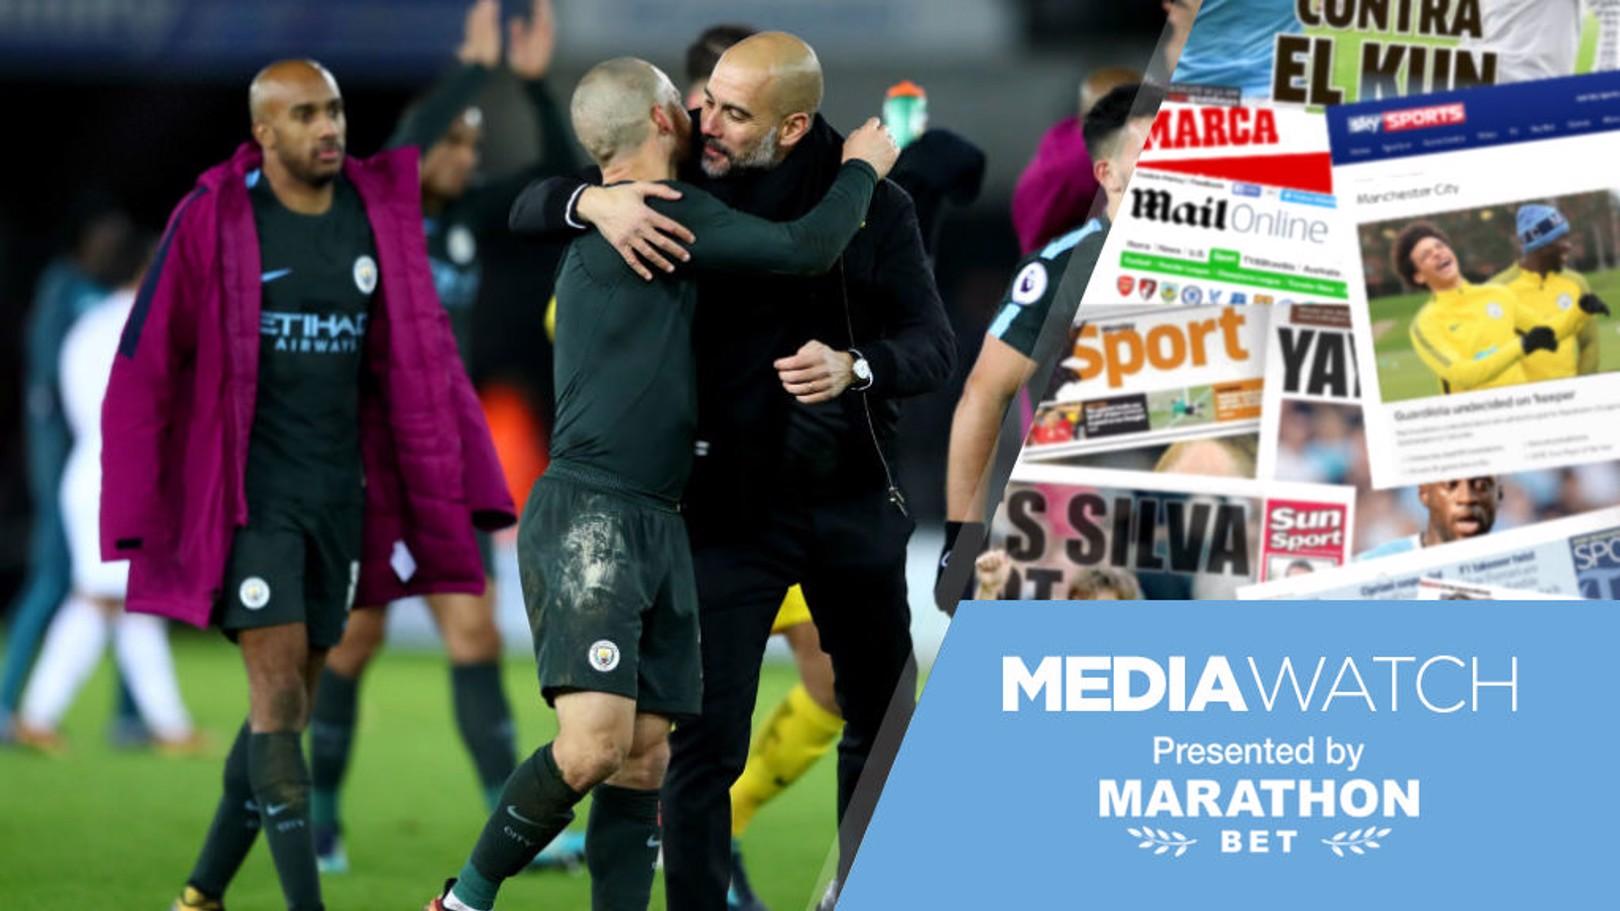 MEDIA WATCH: David Villa has praised the impact Pep has had on Silva